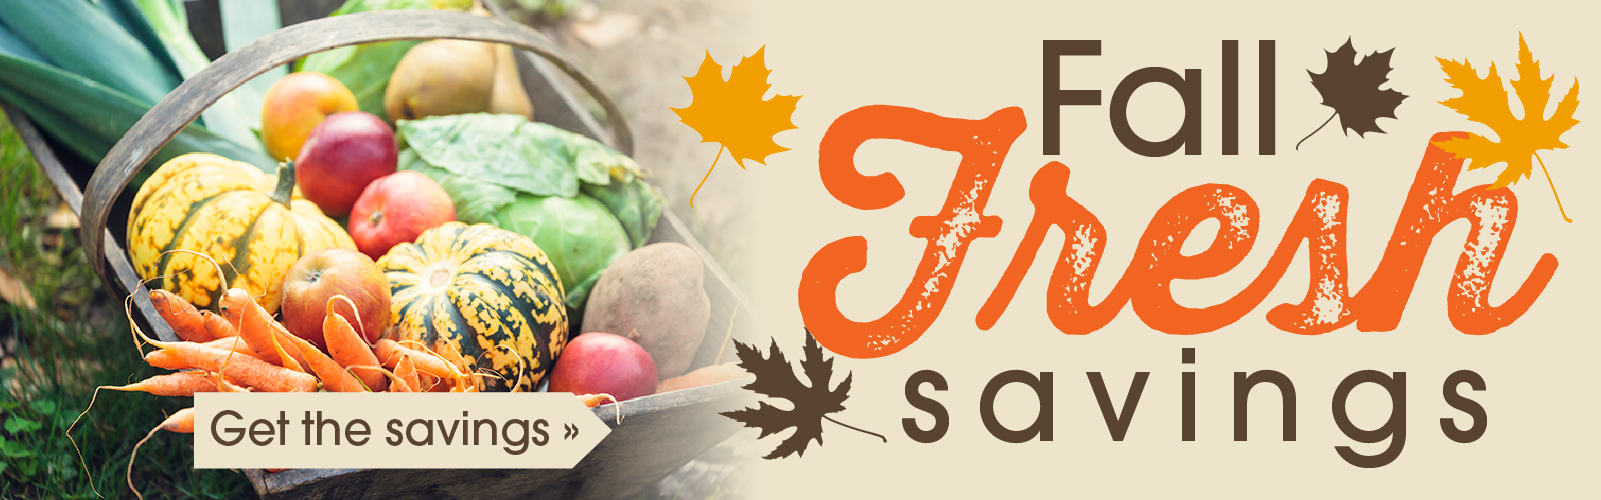 Fall Fresh into Savings